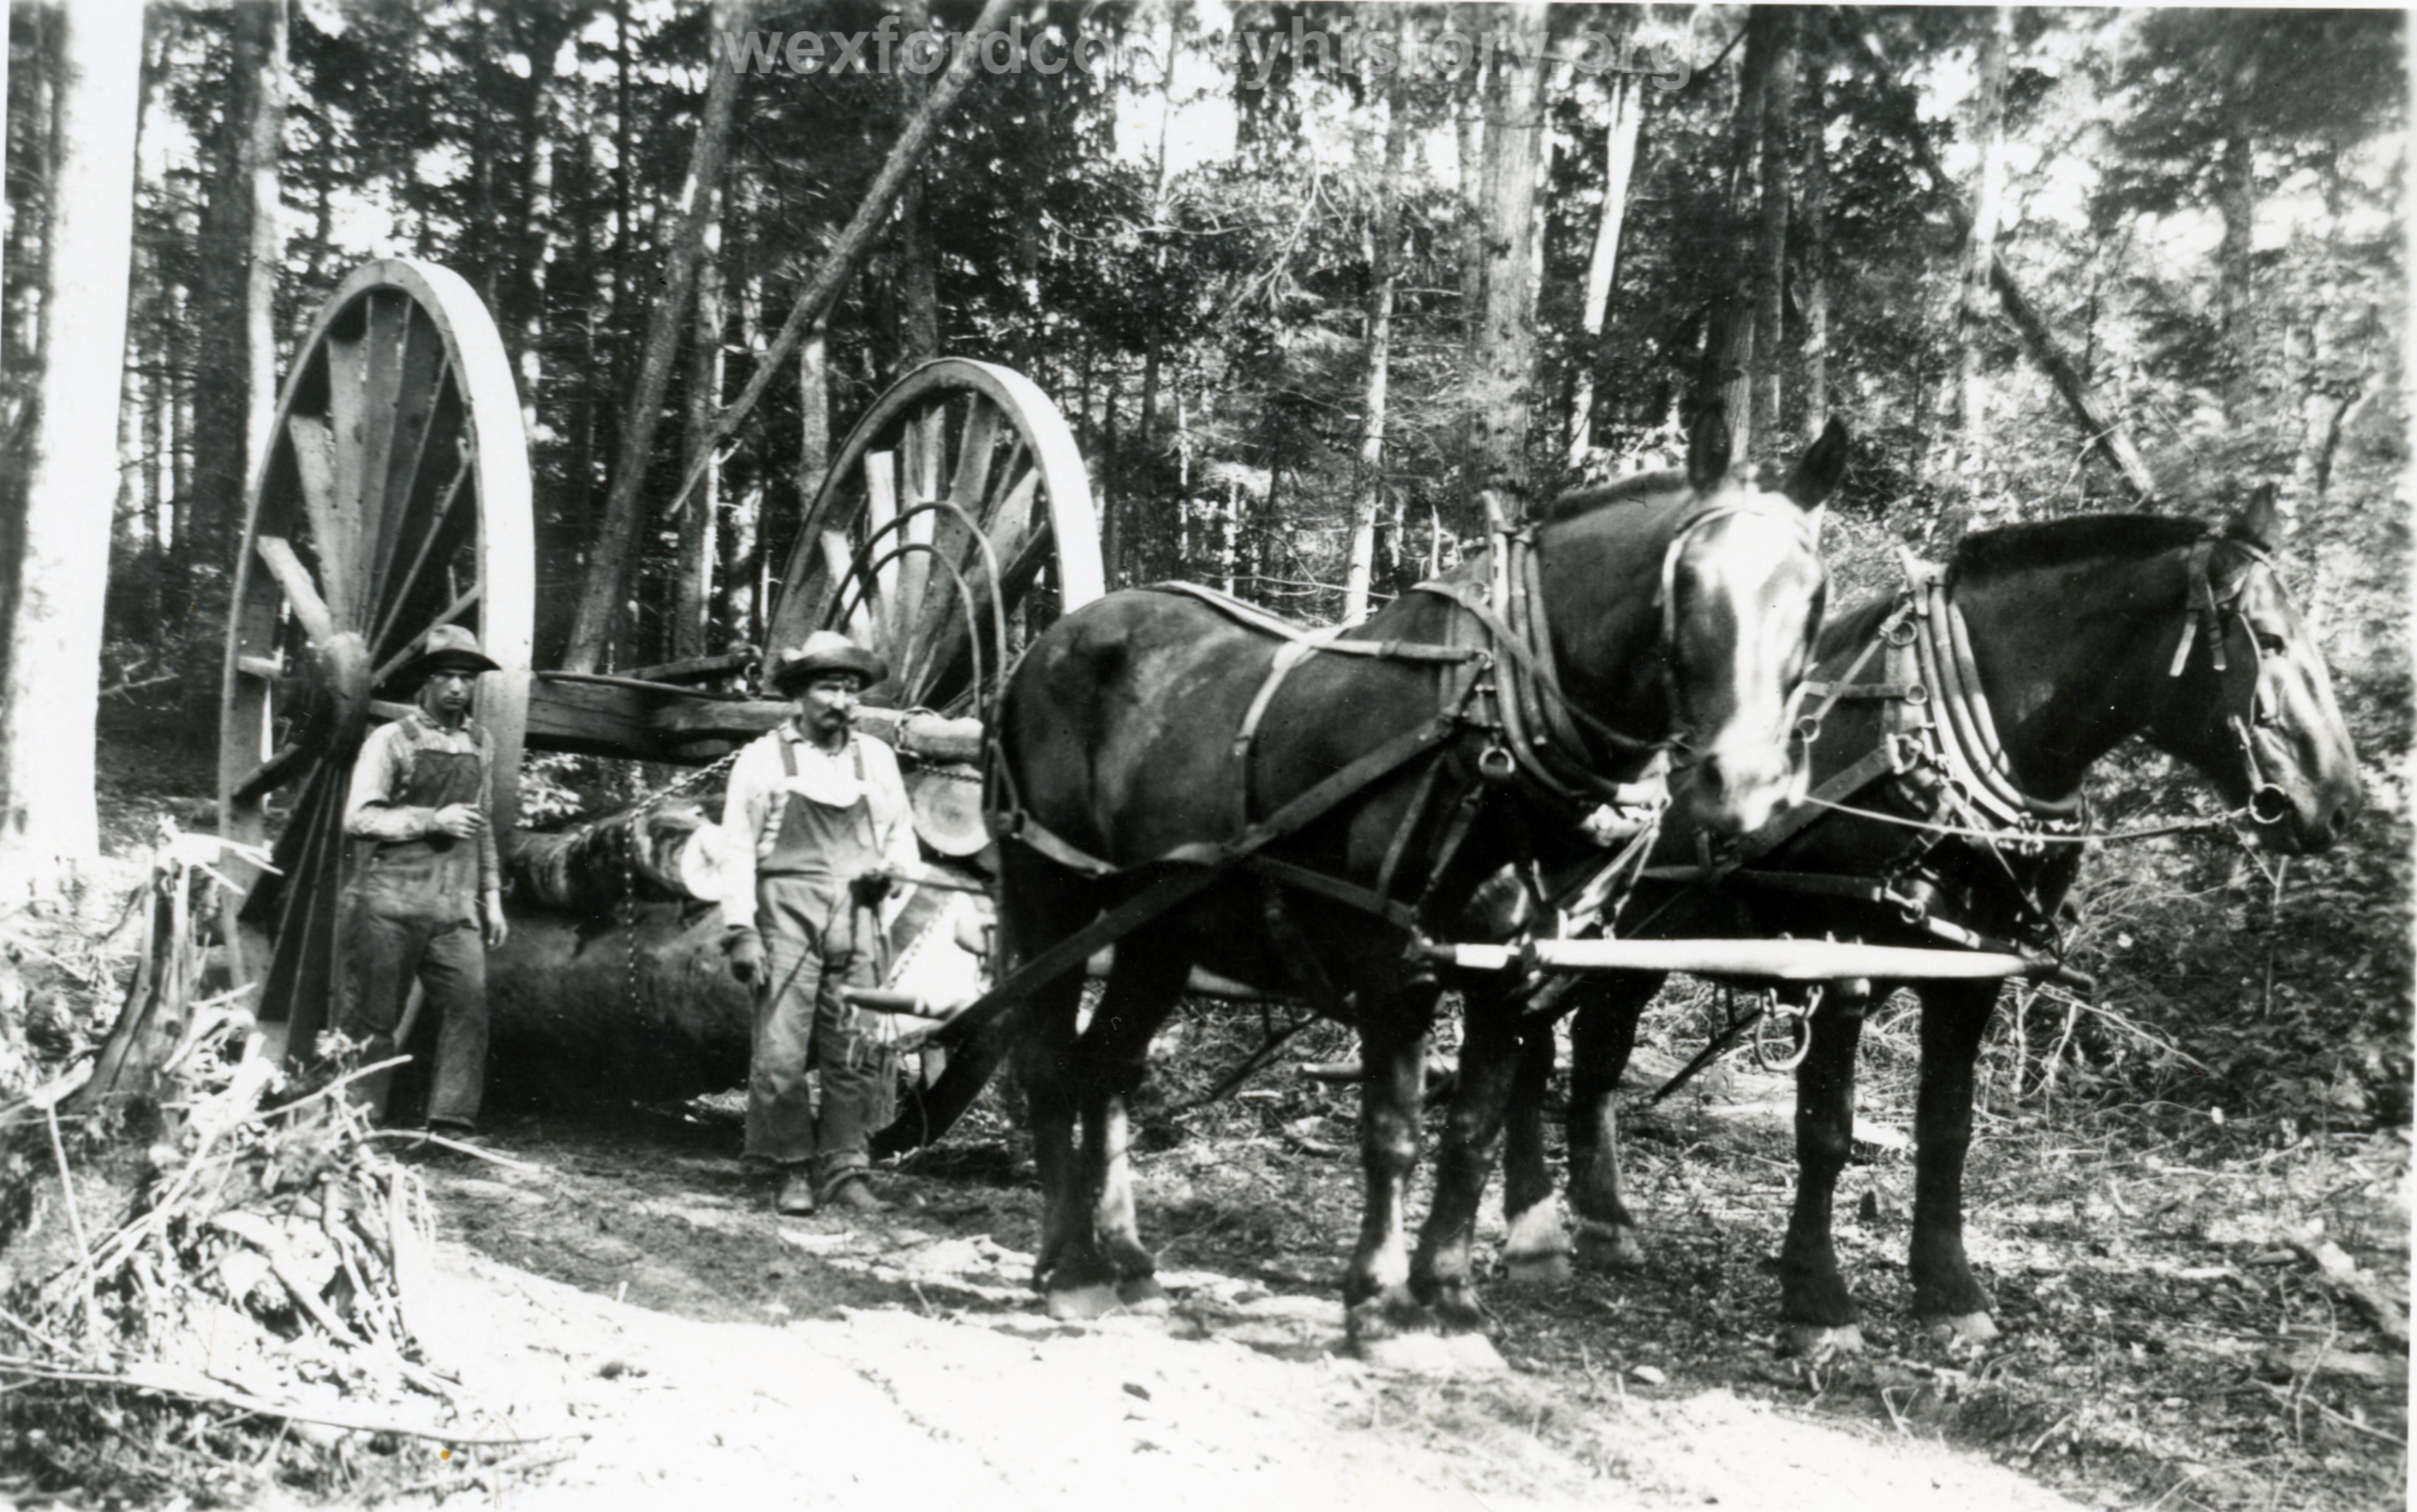 Hoxeyville-Lumber-Peck-Lumber-Camp